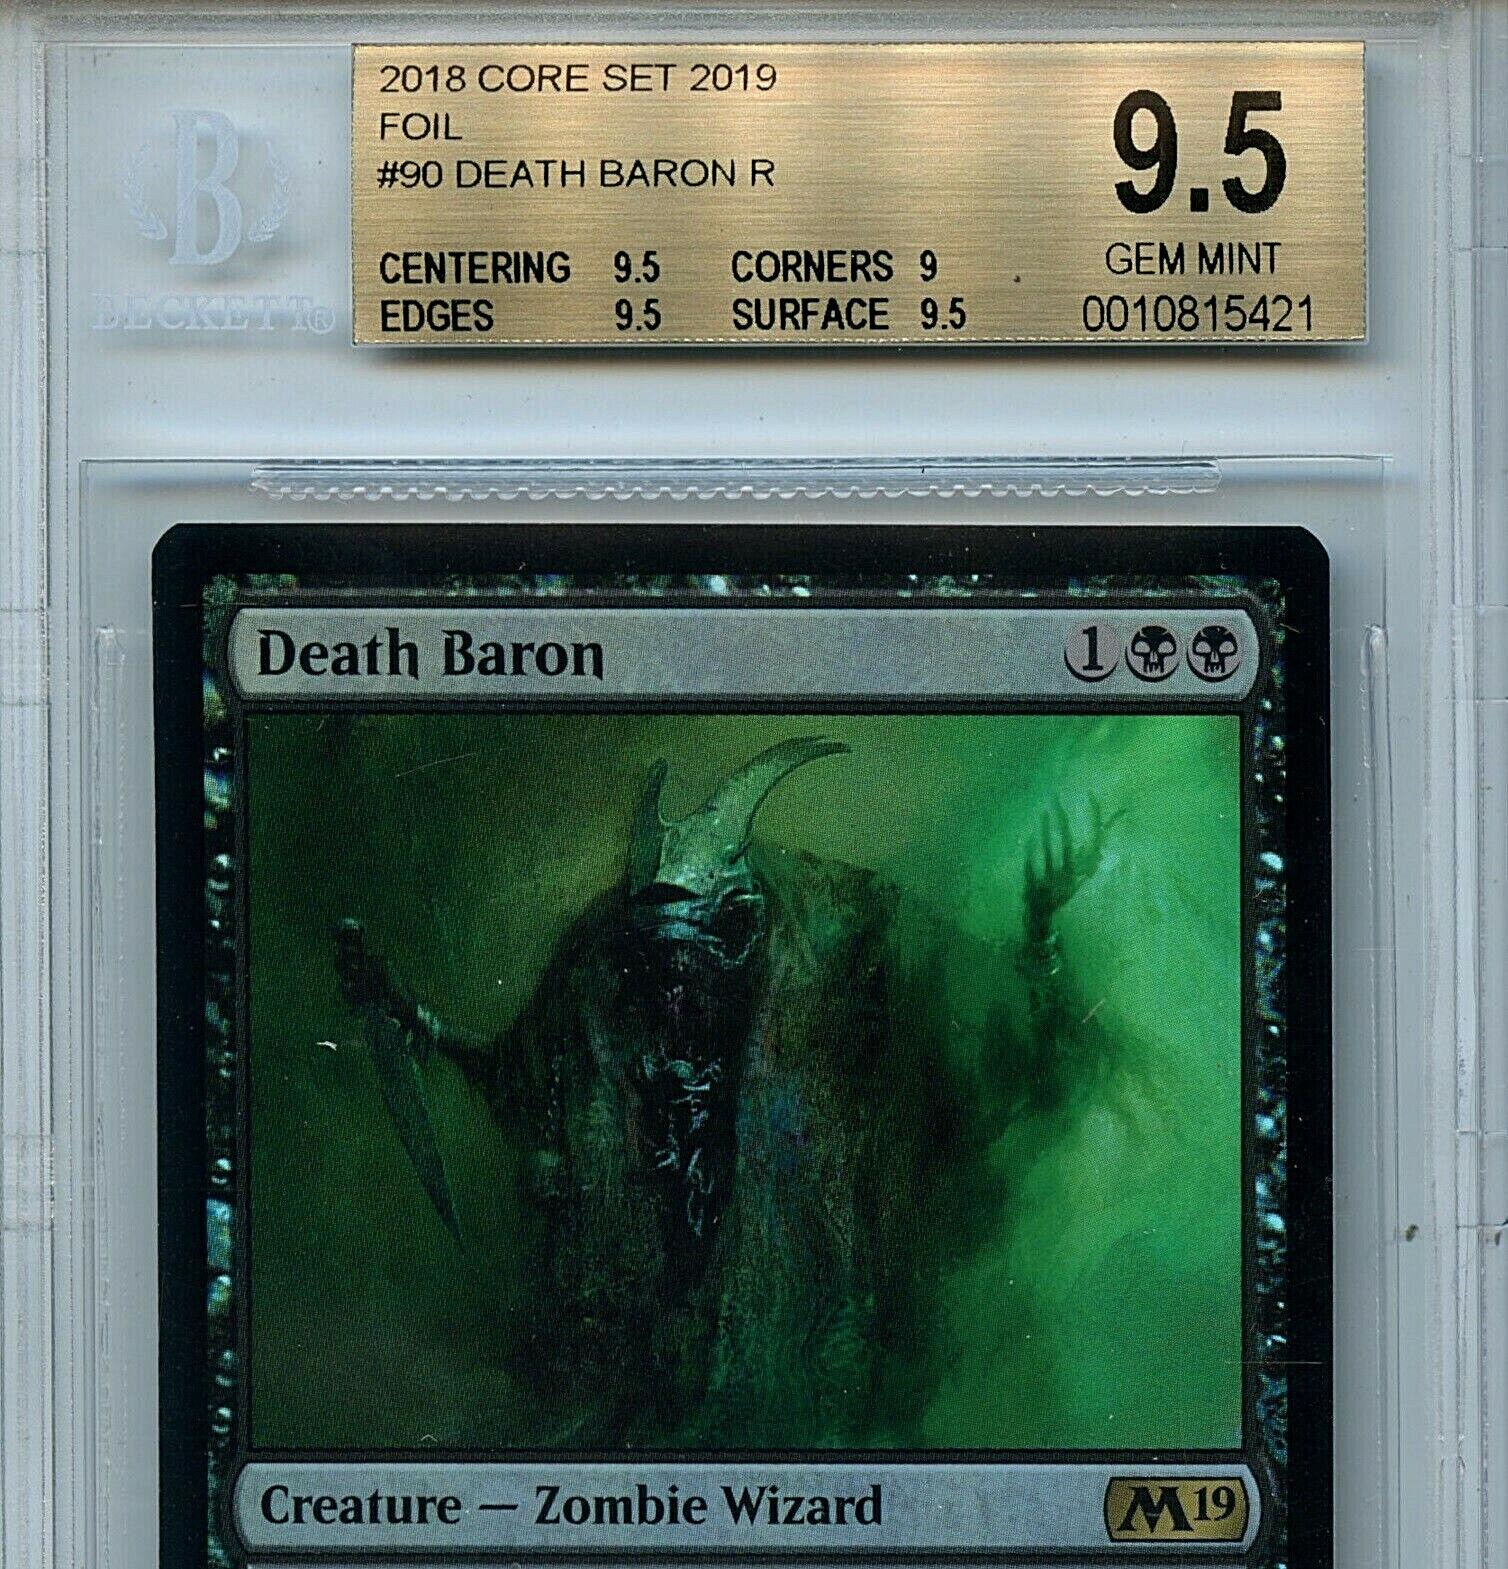 MTG MTG MTG Blood Baron BGS 9.5 Gem Mint M19 Core Set Magic Card Amricons 5421 32cf62